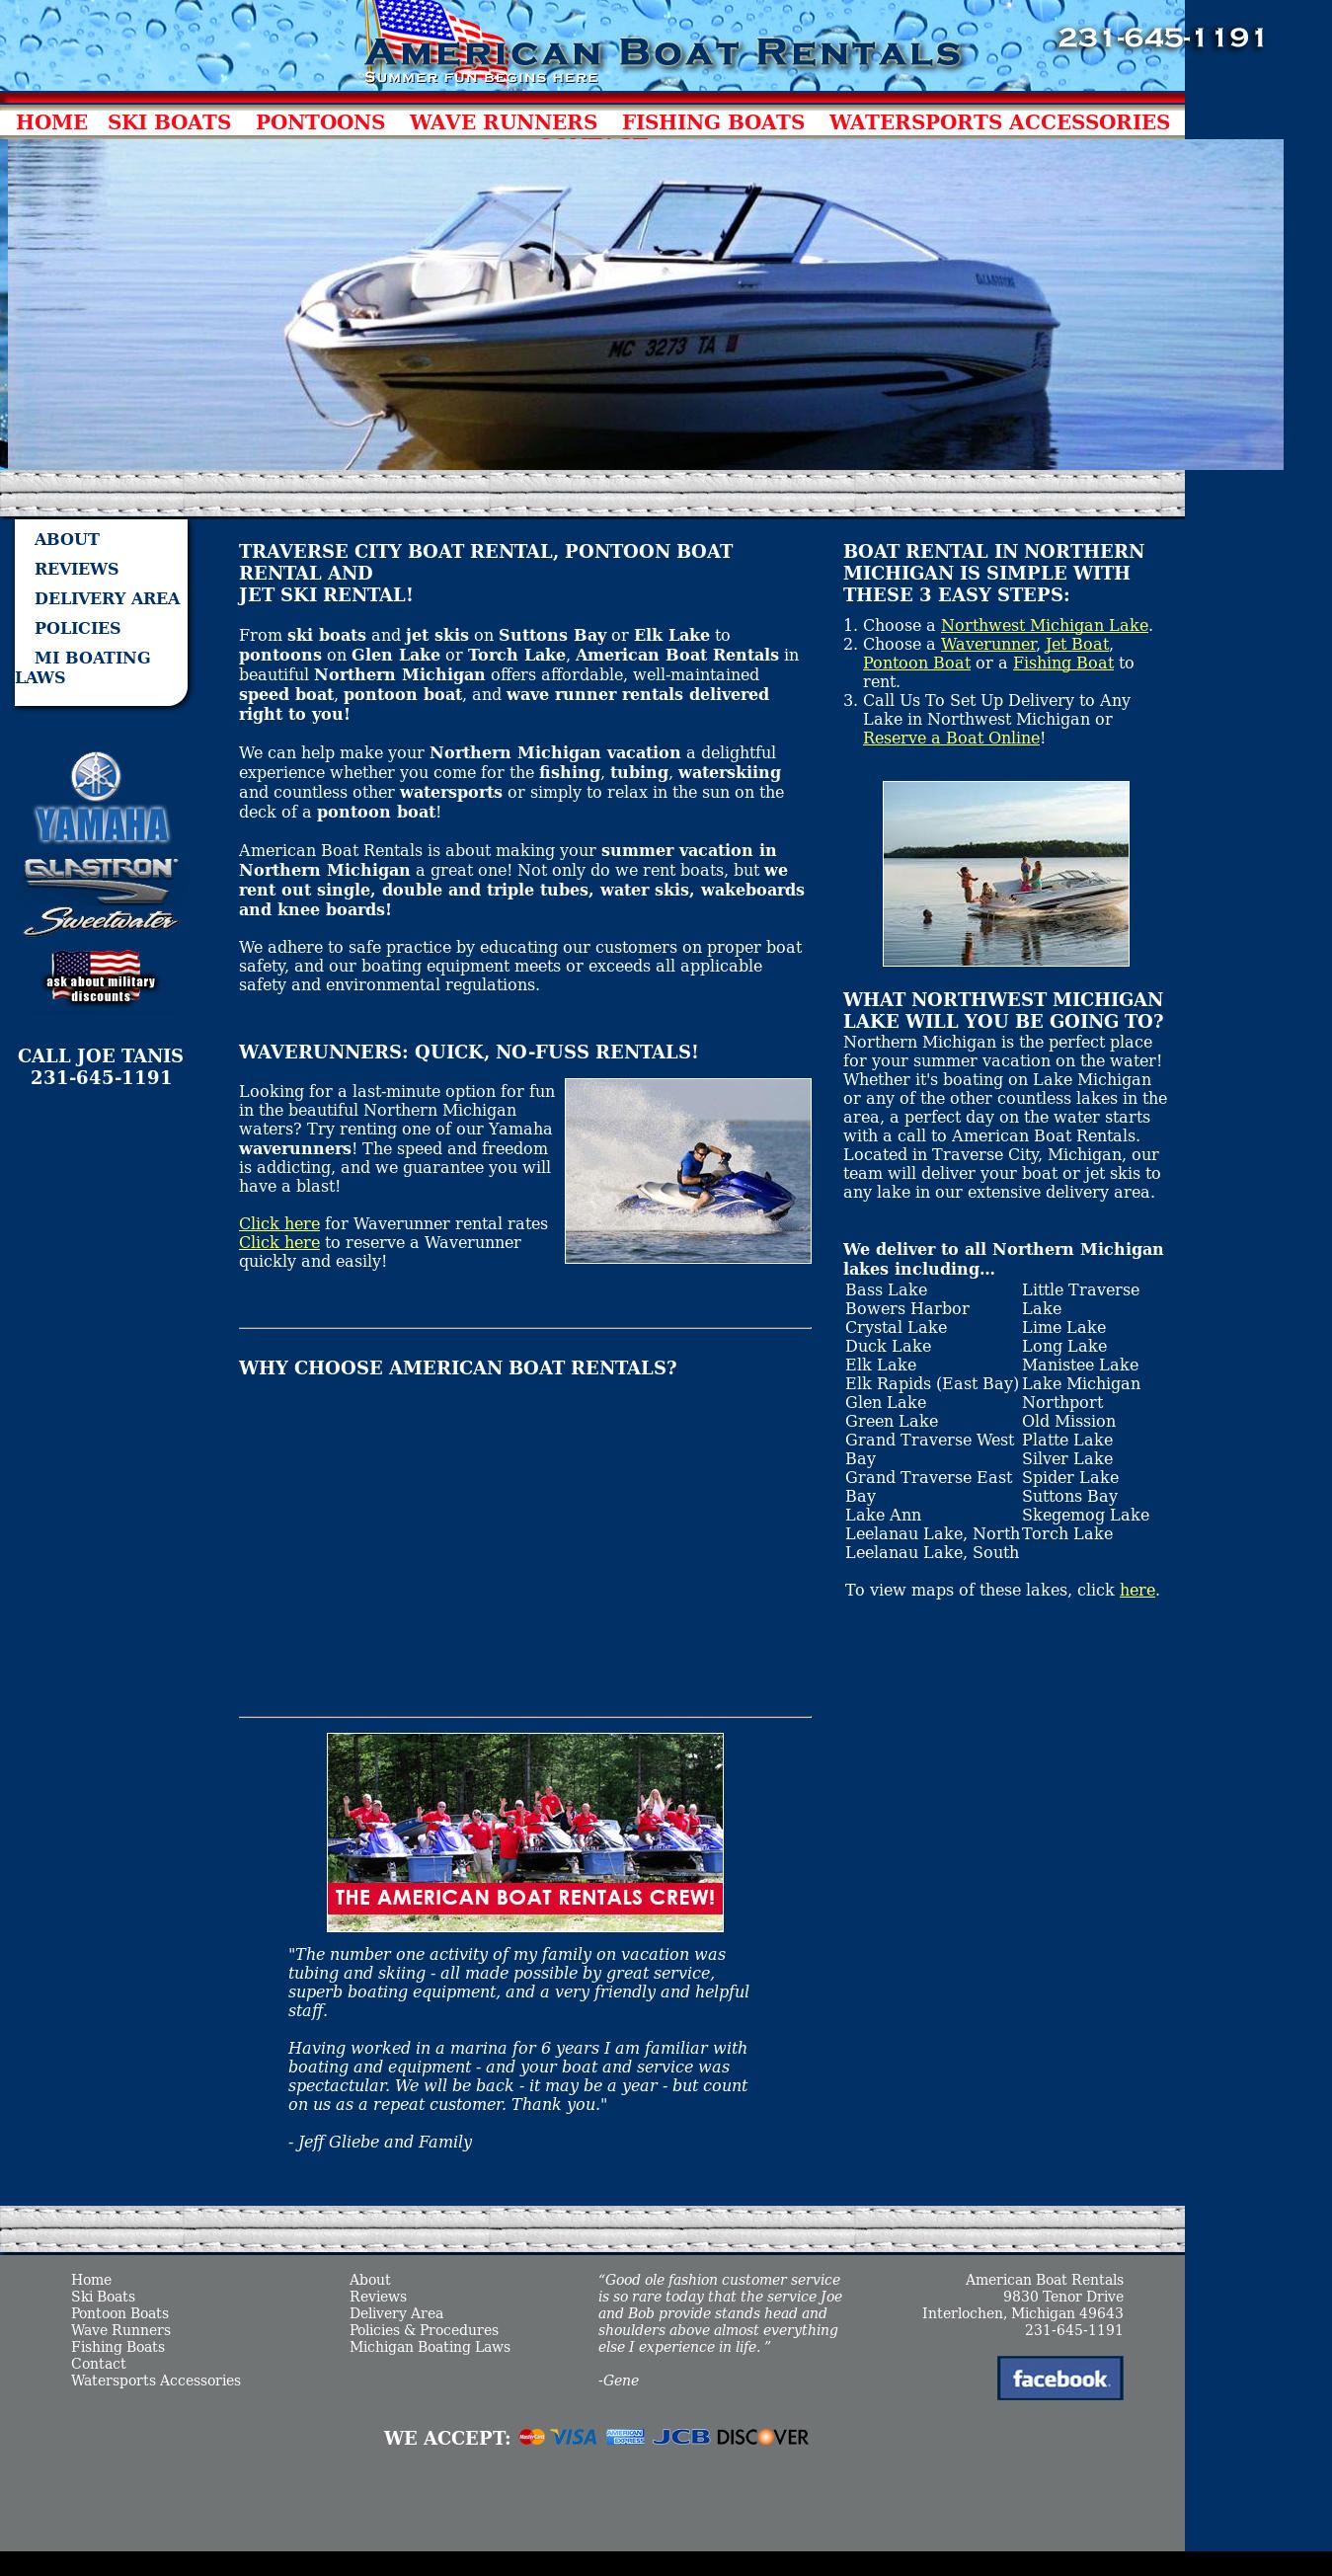 American Boat Rentals - Your Northern Michigan Boat Rental